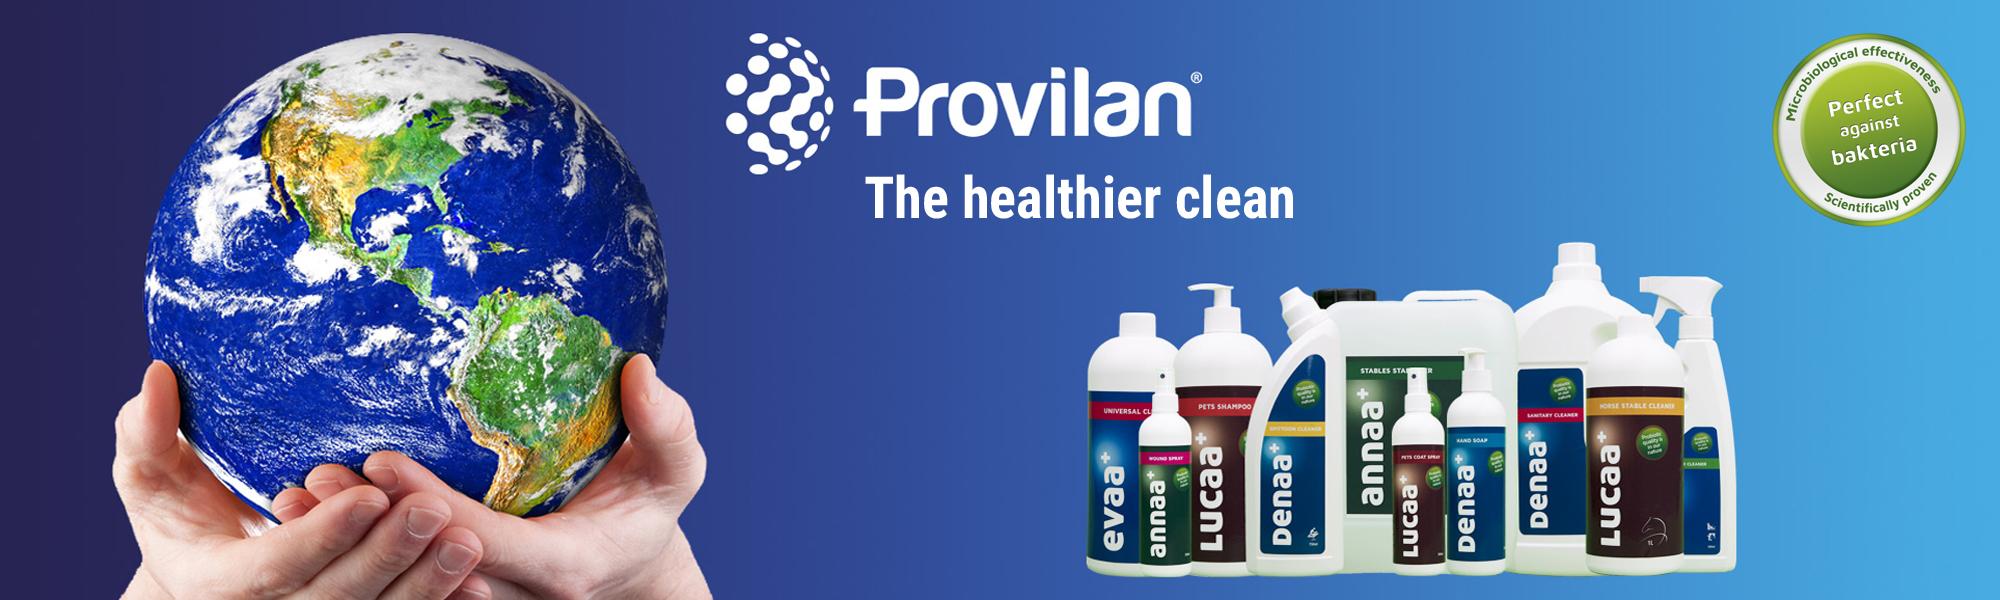 Provilan. More than just innovation.